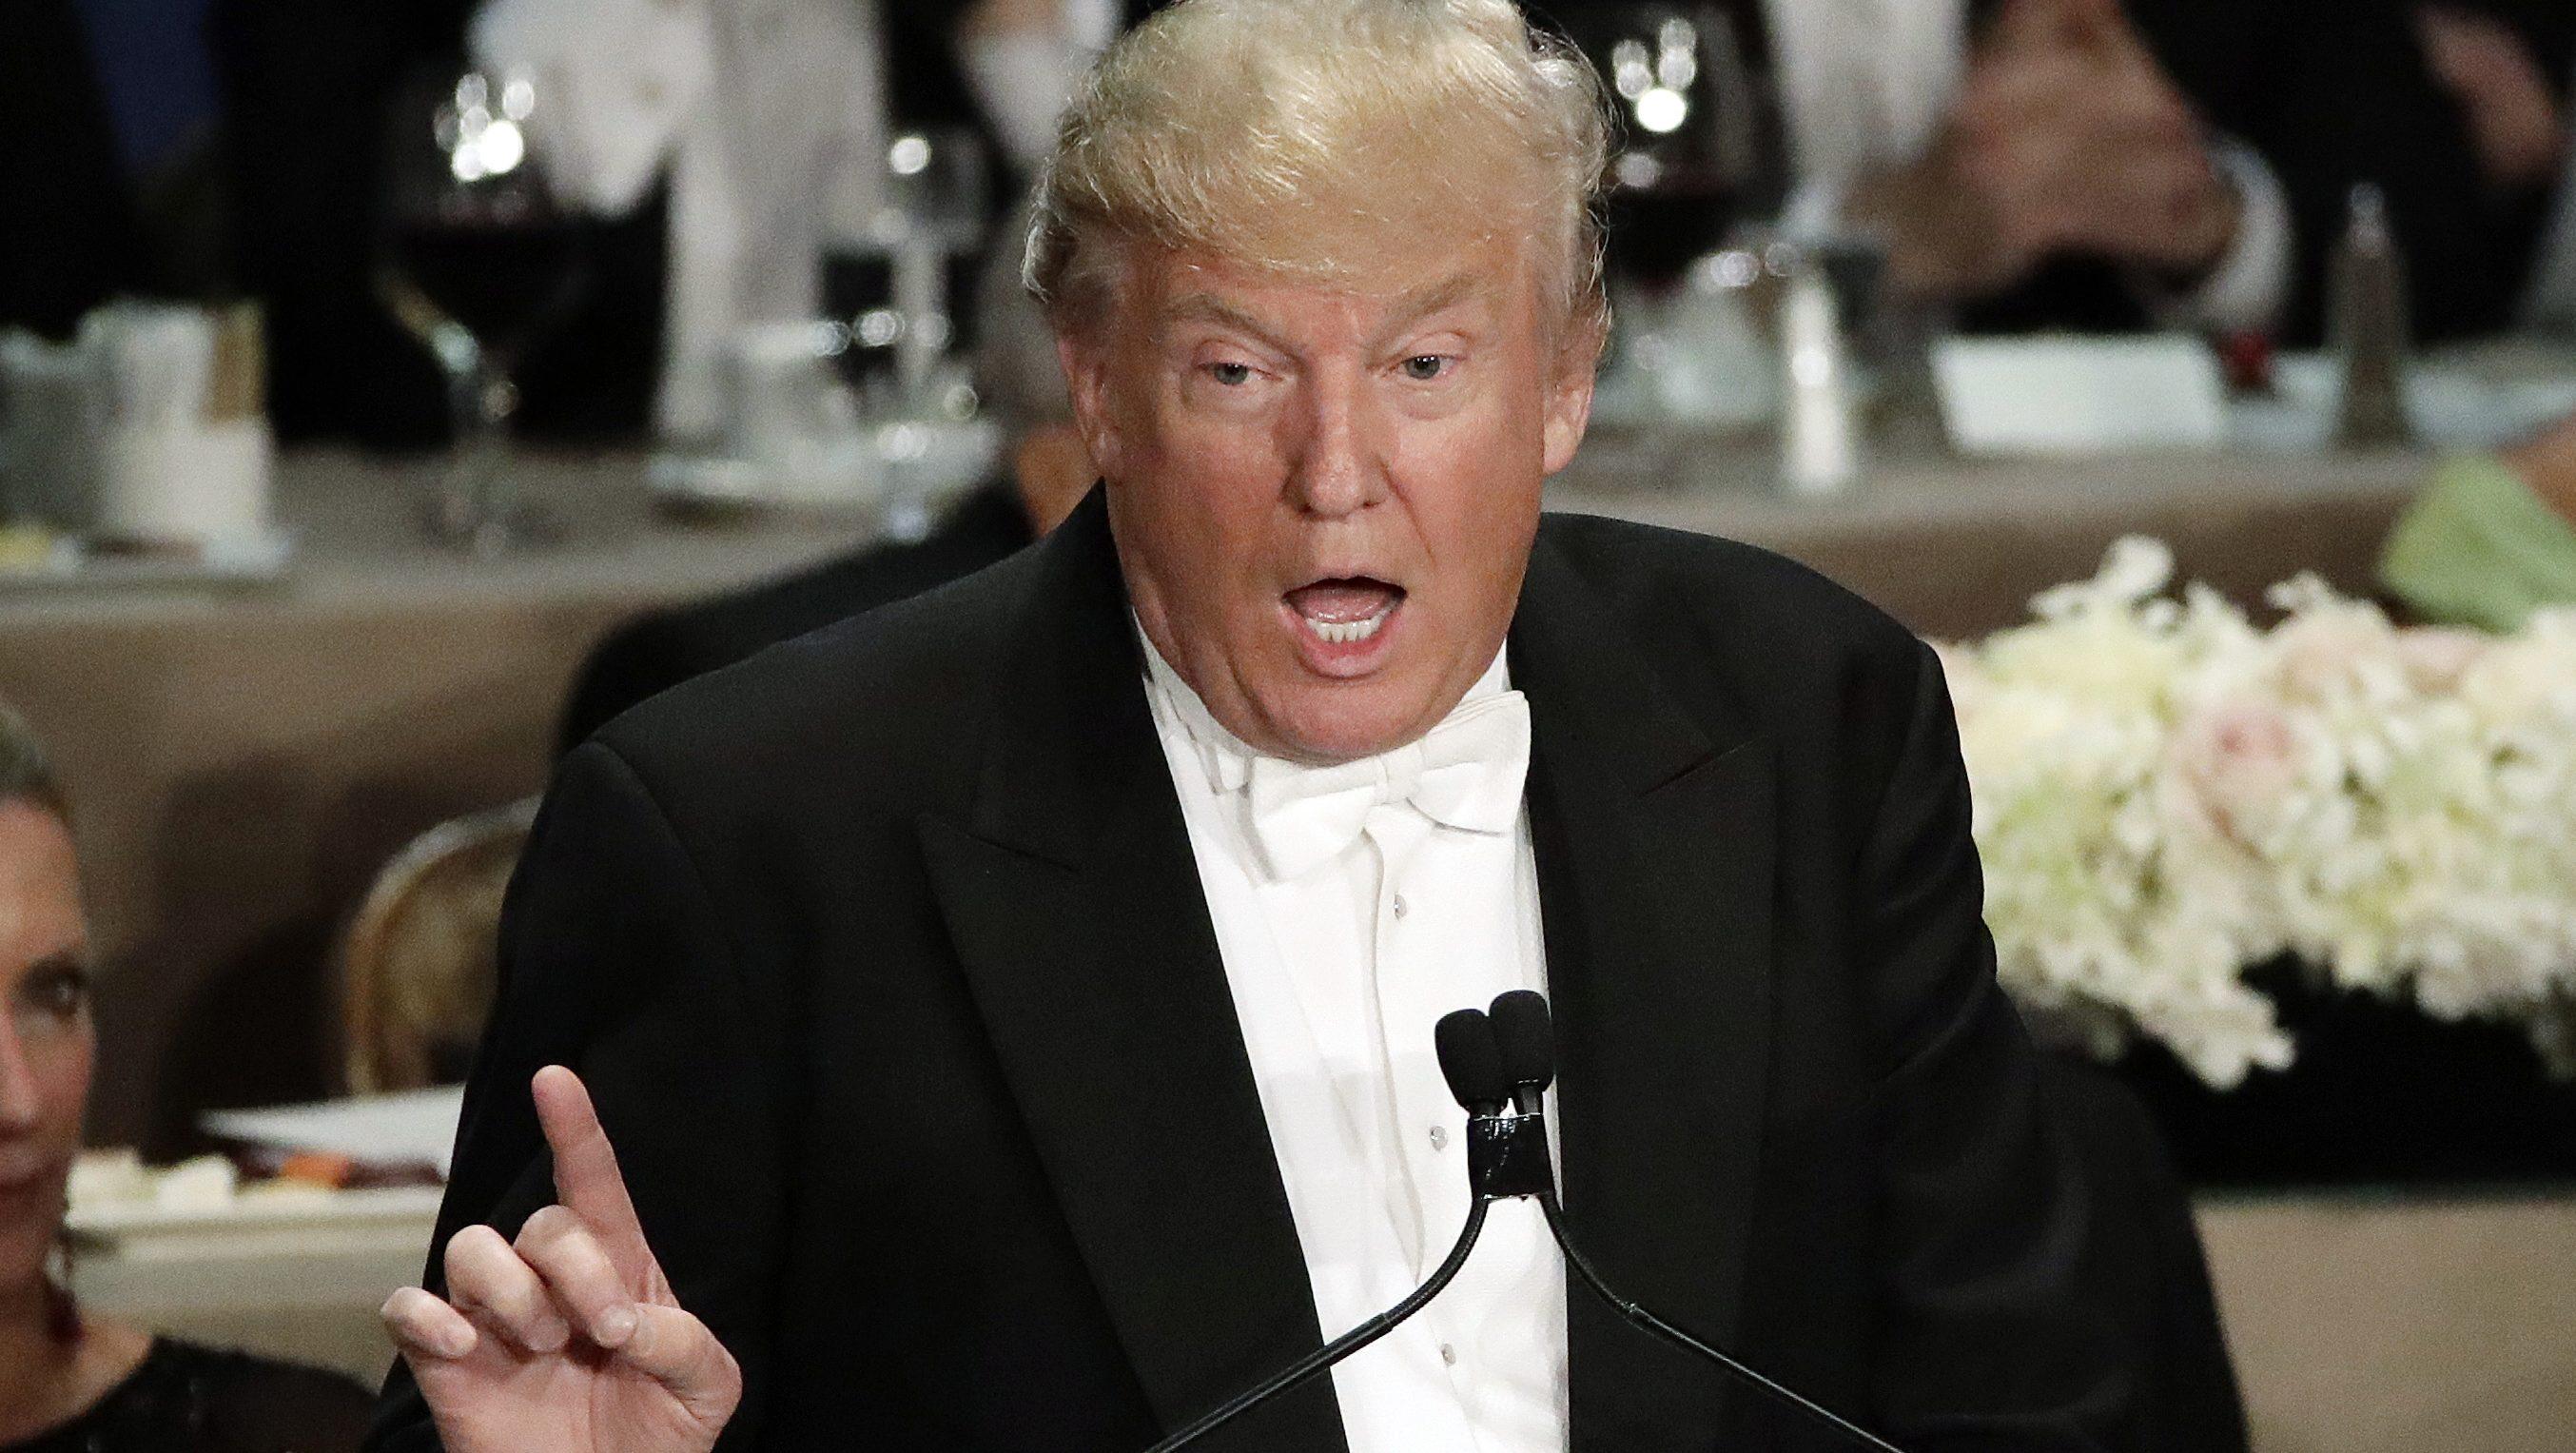 Donald Trump at the lectern.